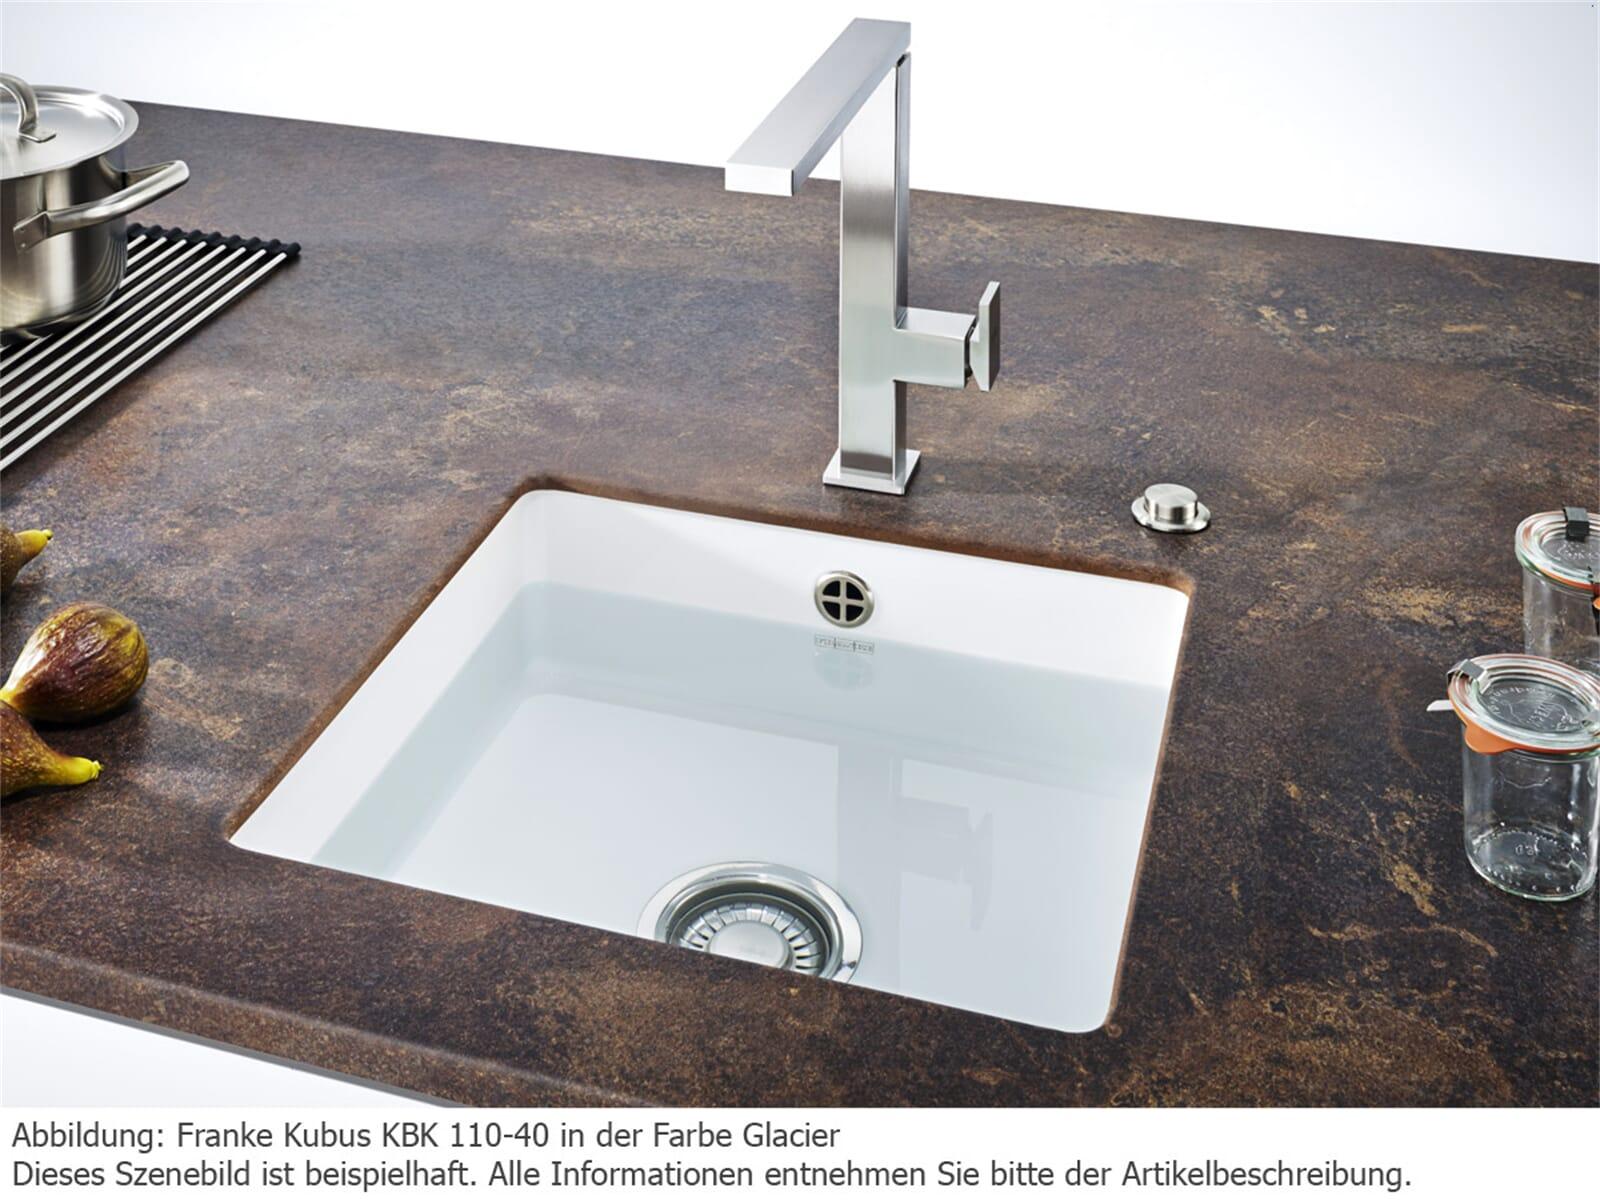 Franke Kubus KBK 110-40 Cashmere - 126.0335.876 Keramikspüle